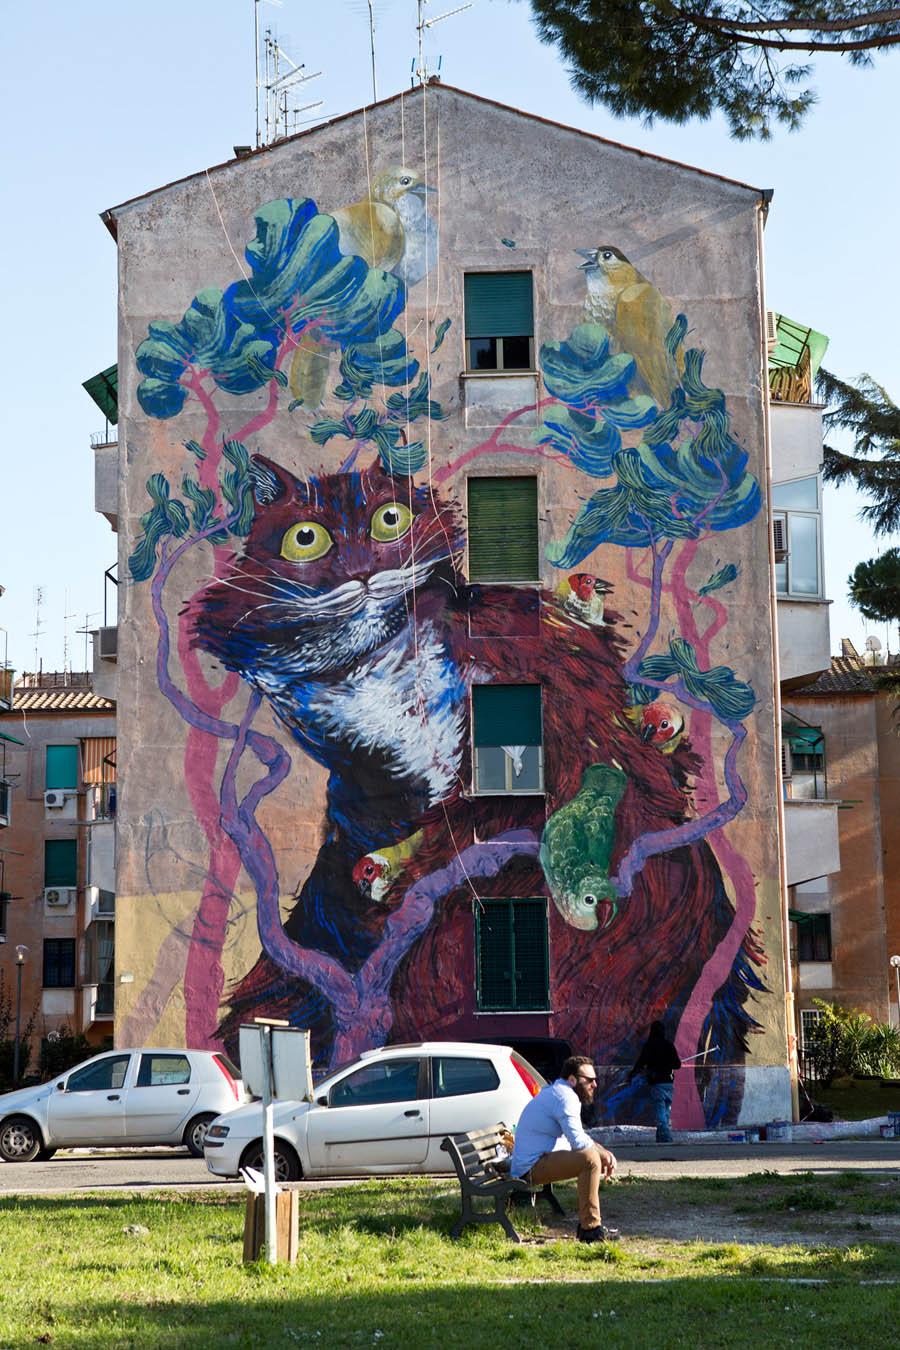 Hitnes_SanBa-San Basilio - GriotMagazine